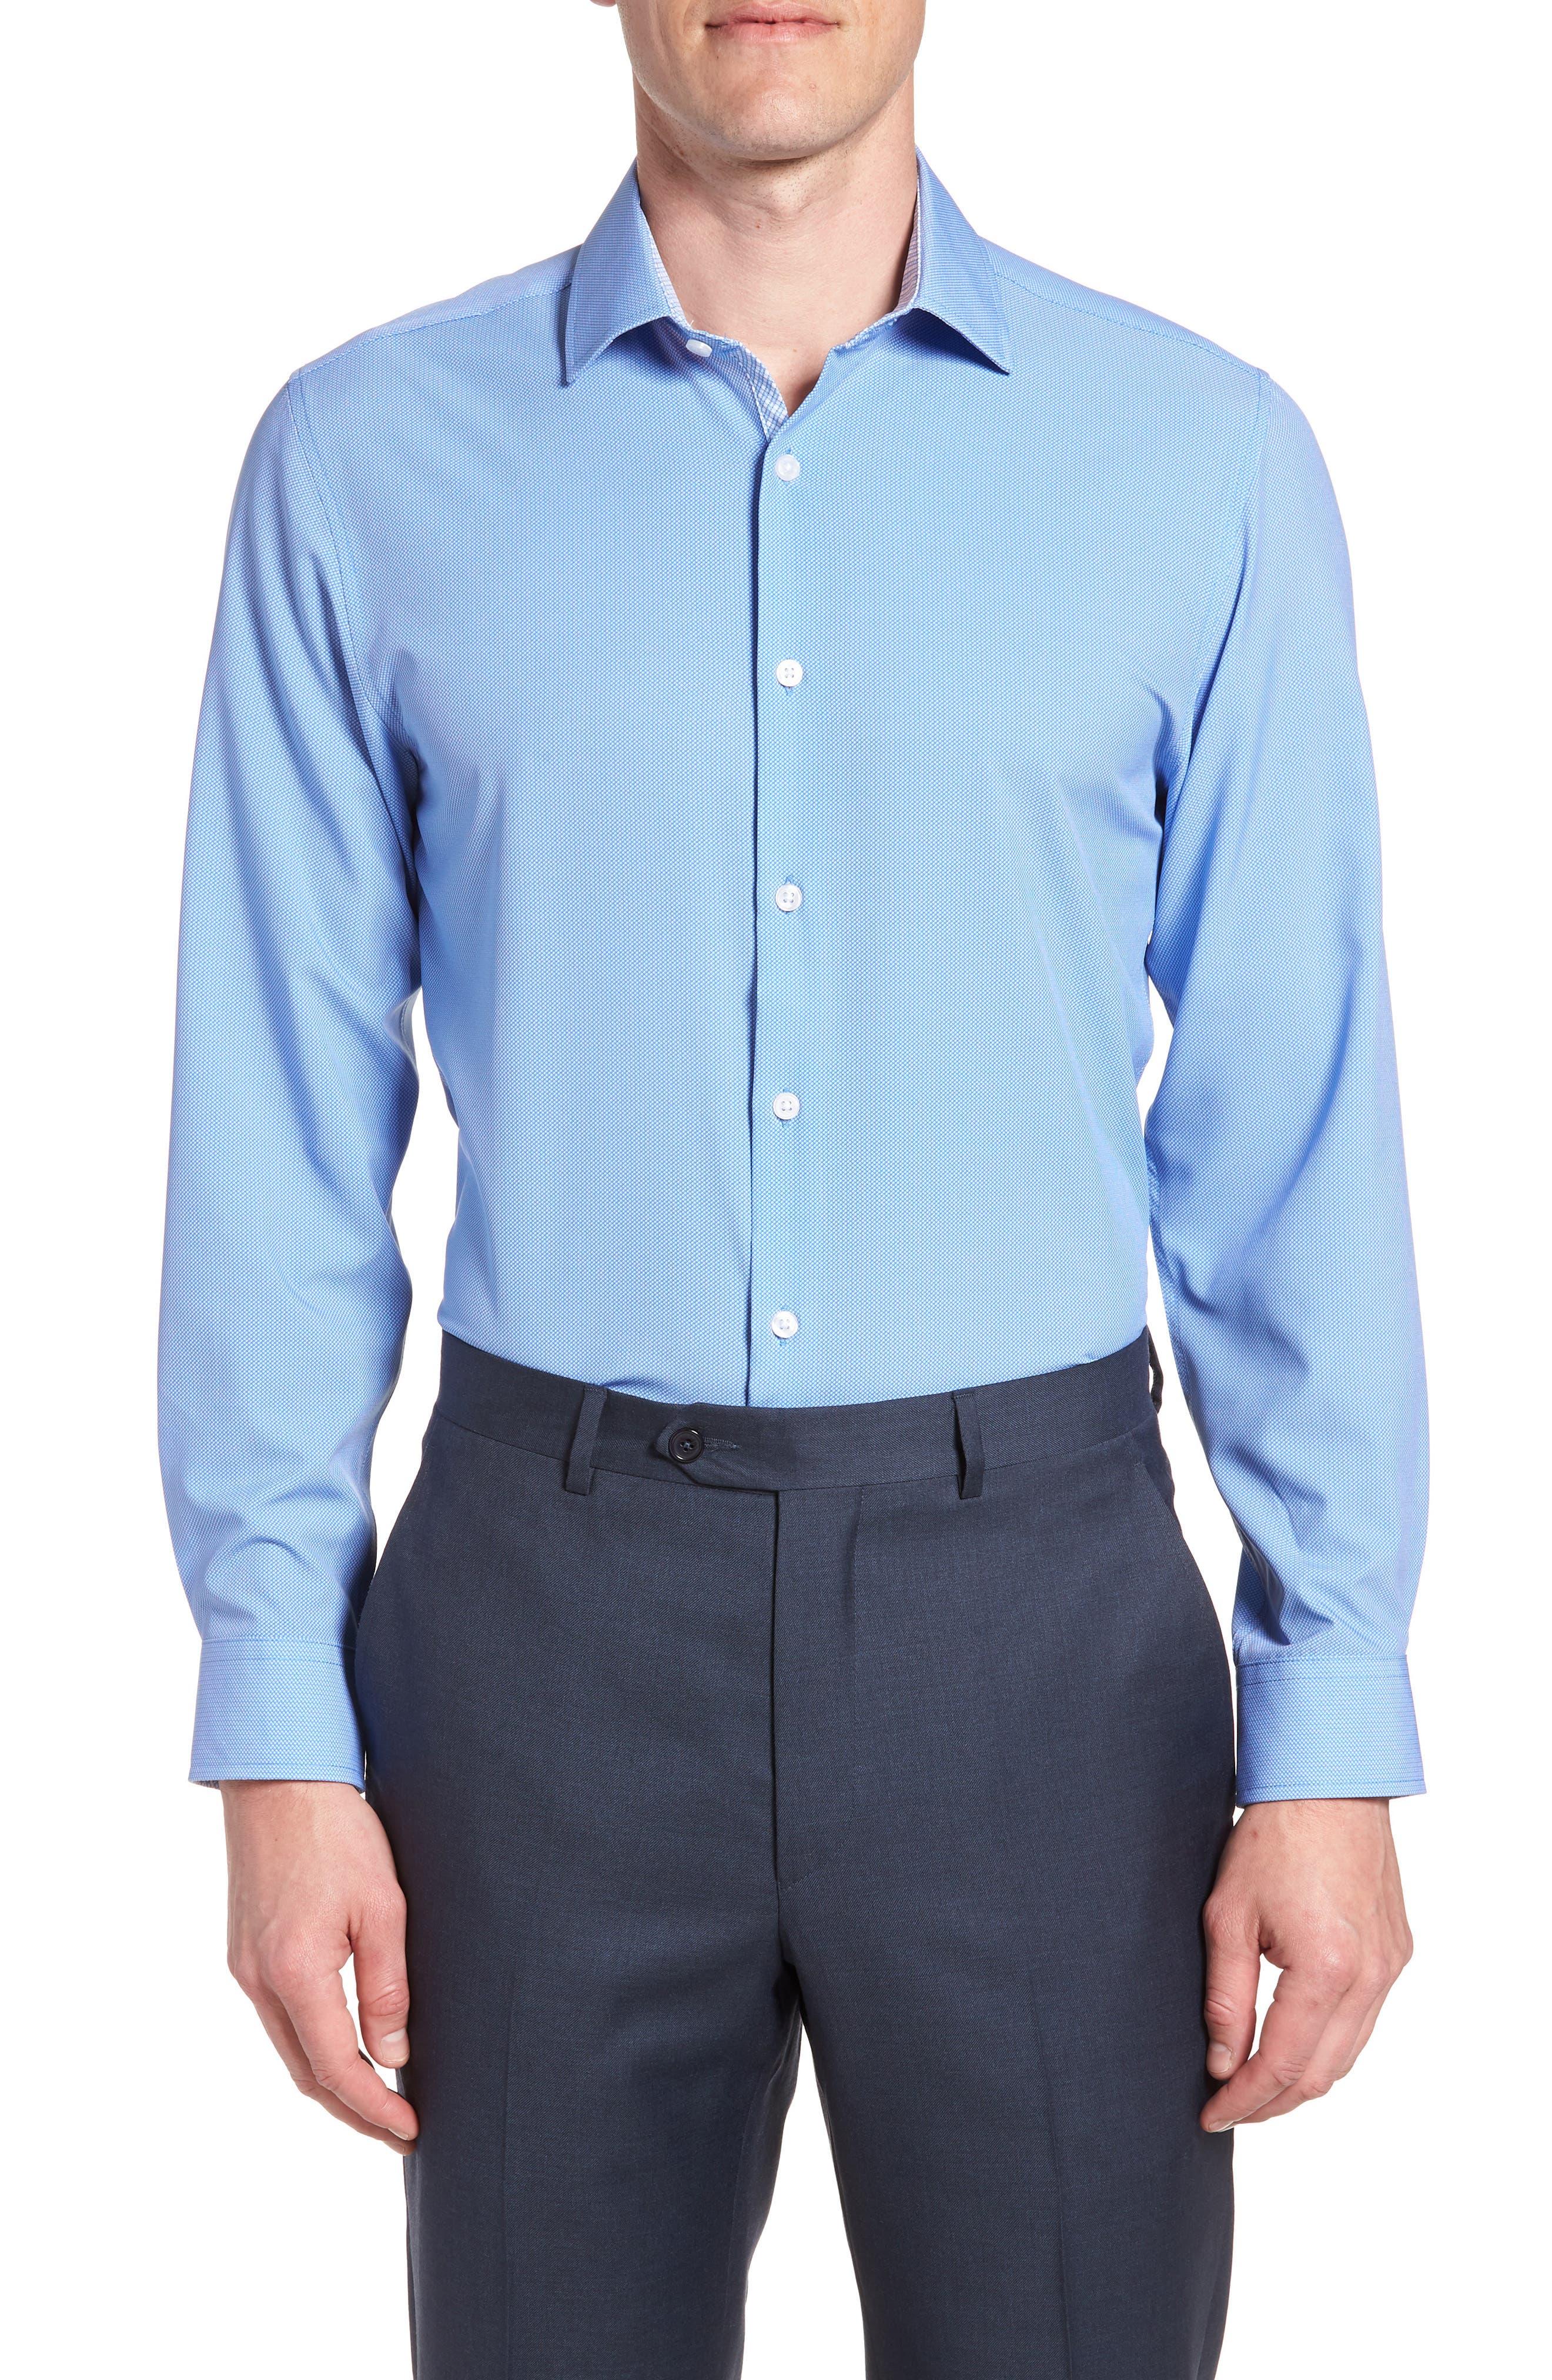 Trim Fit 4-Way Stretch Dress Shirt,                             Main thumbnail 1, color,                             NAVY